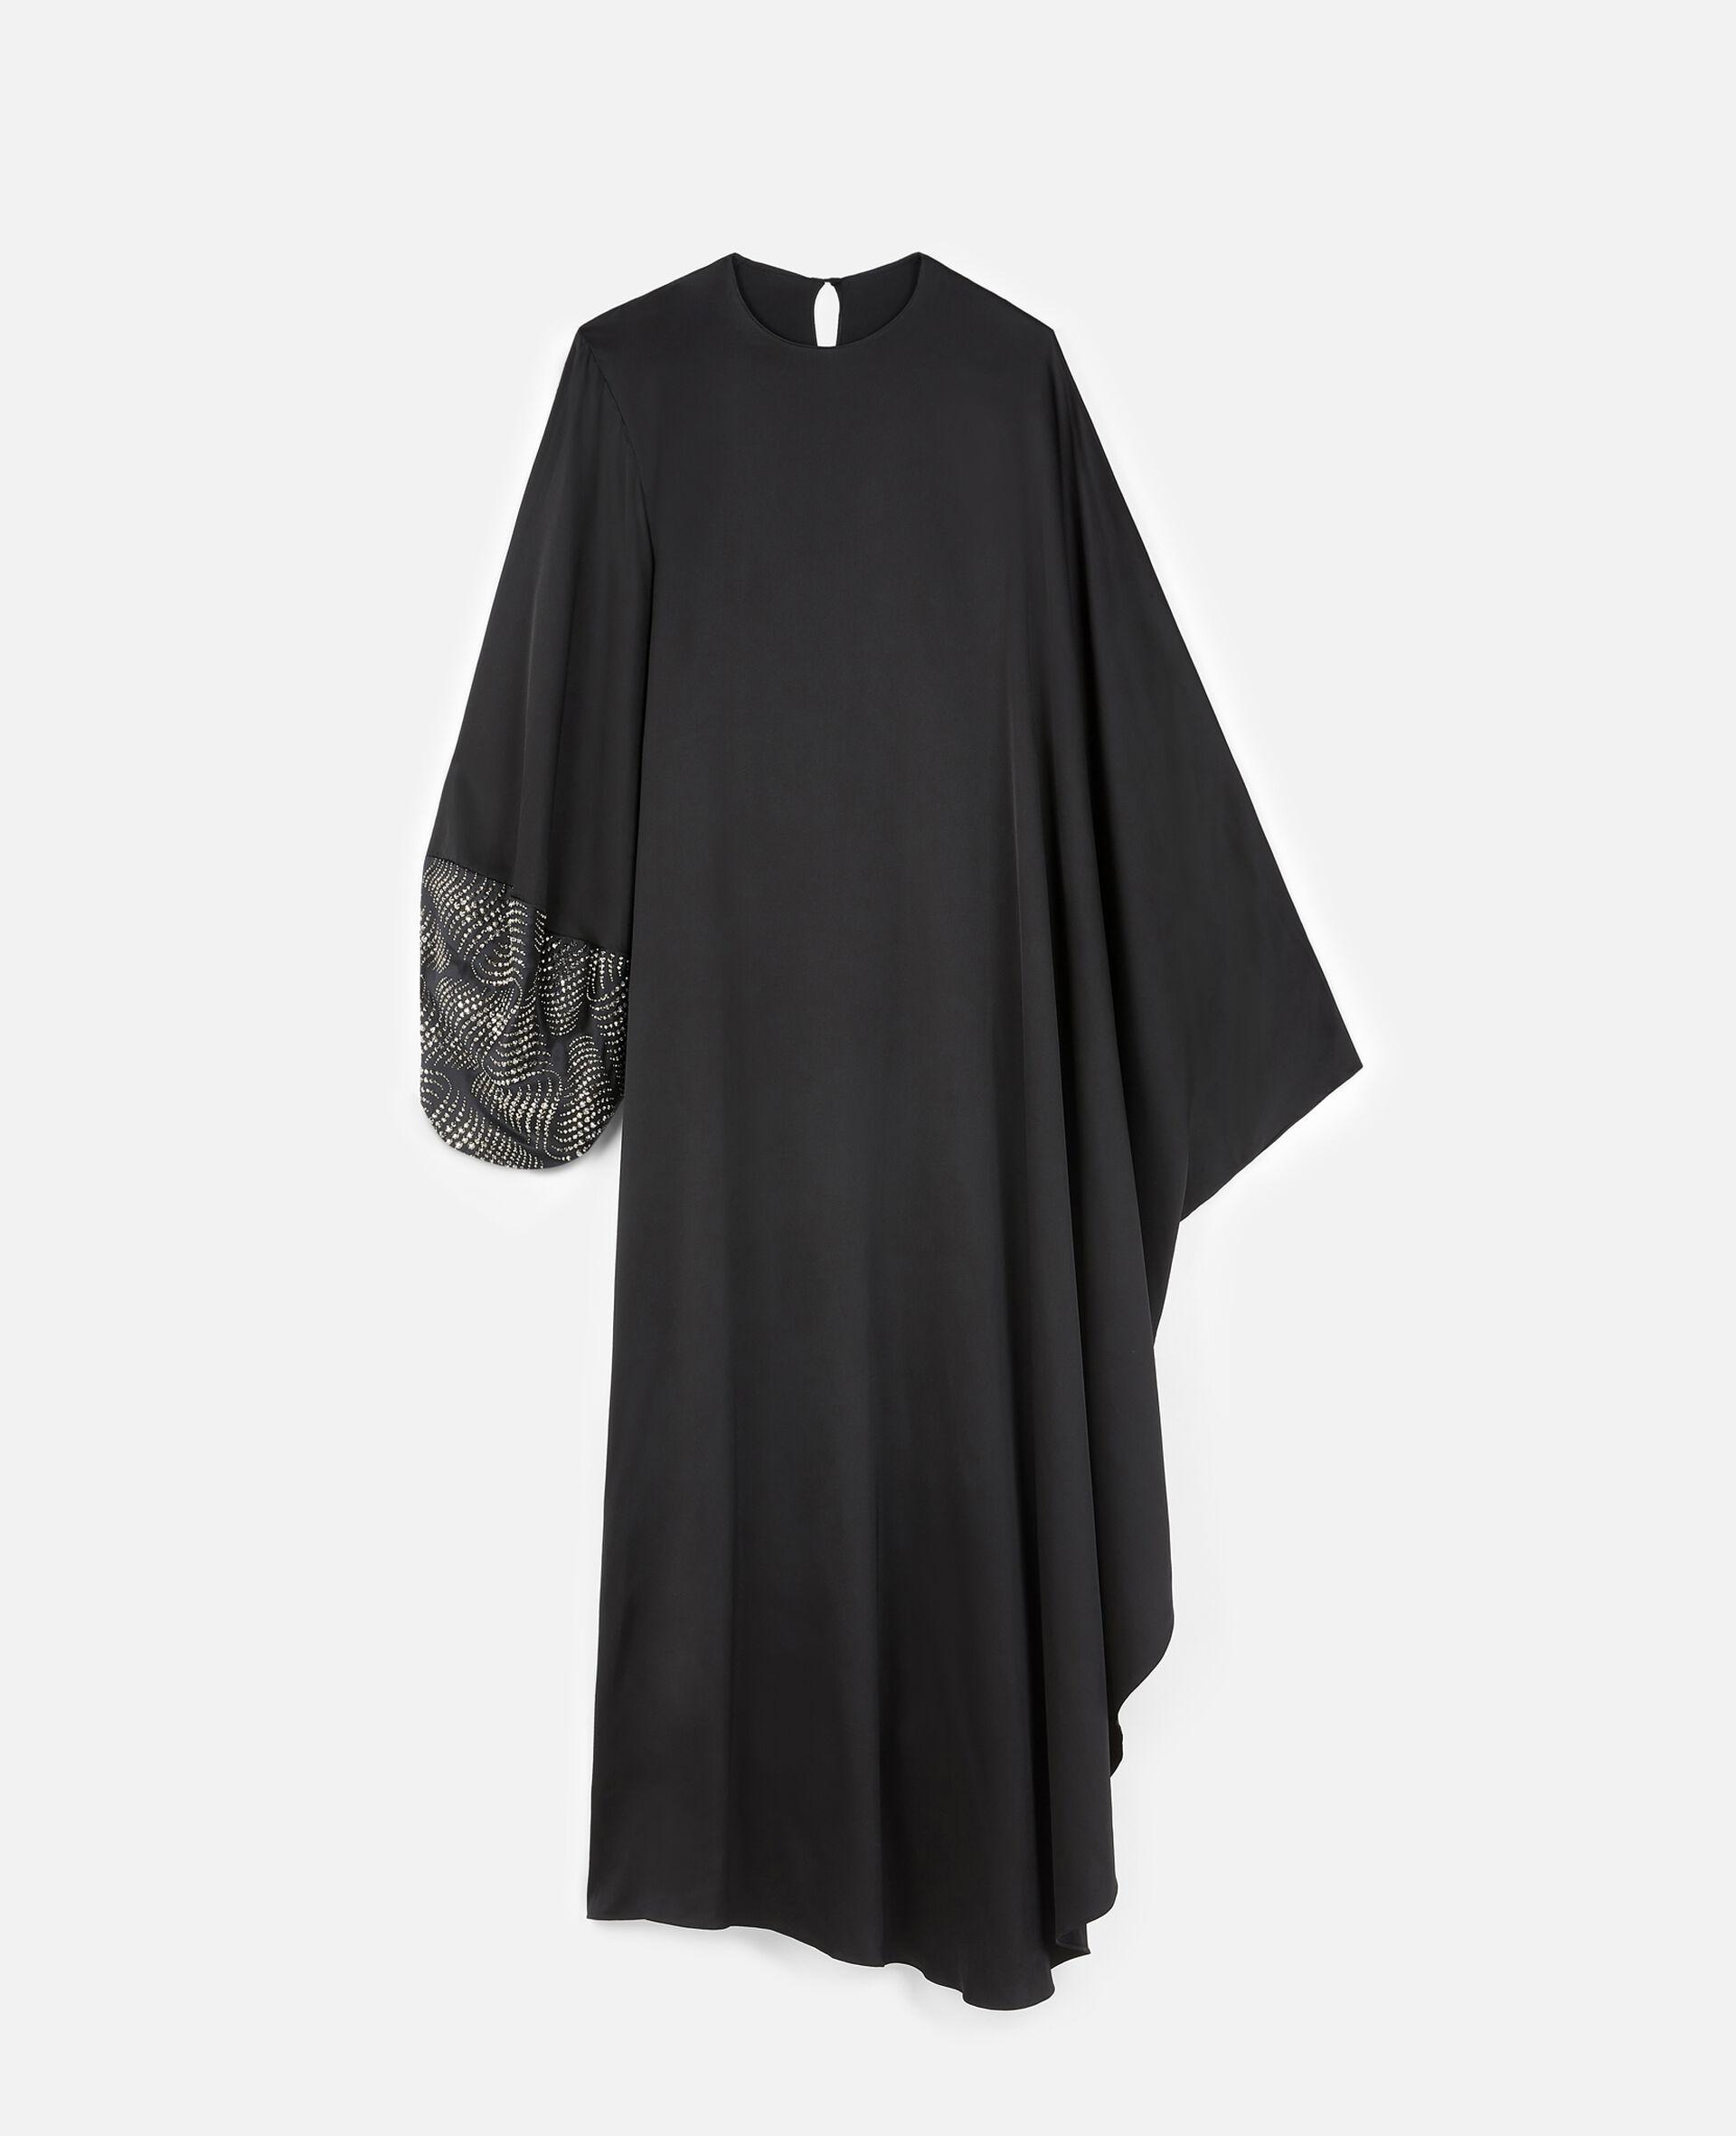 Robe Aliyah avec détail thermocollé-Noir-large image number 0